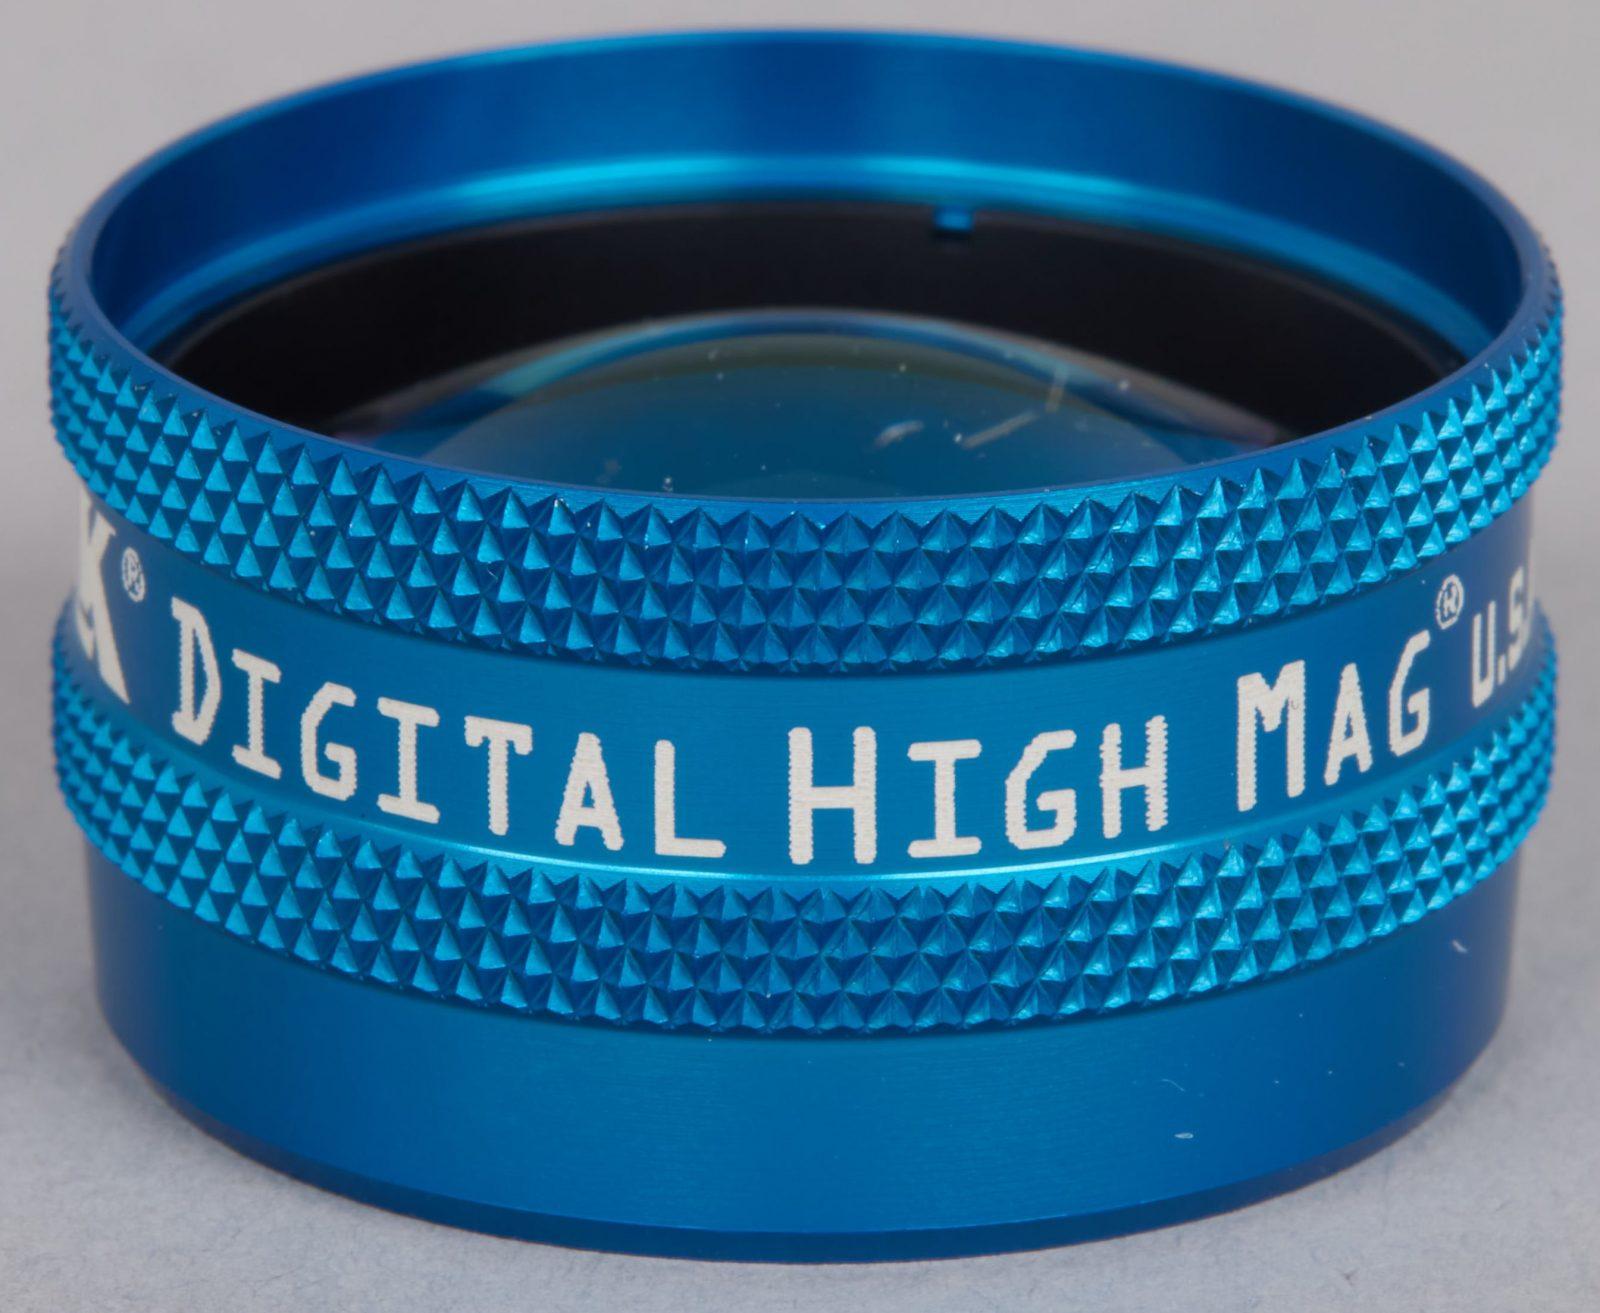 Digital High Mag®